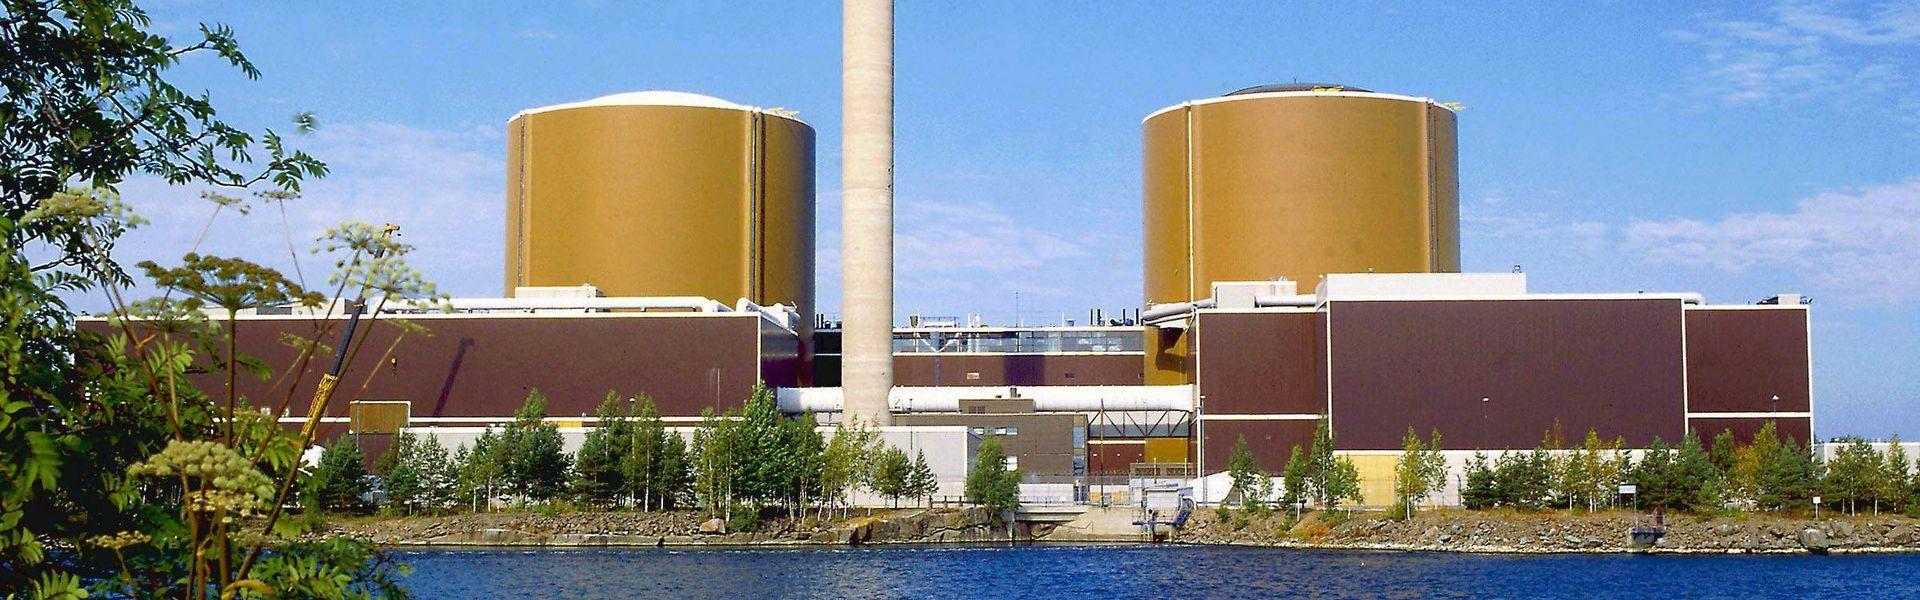 Loviisa nuclear power plant, Finland